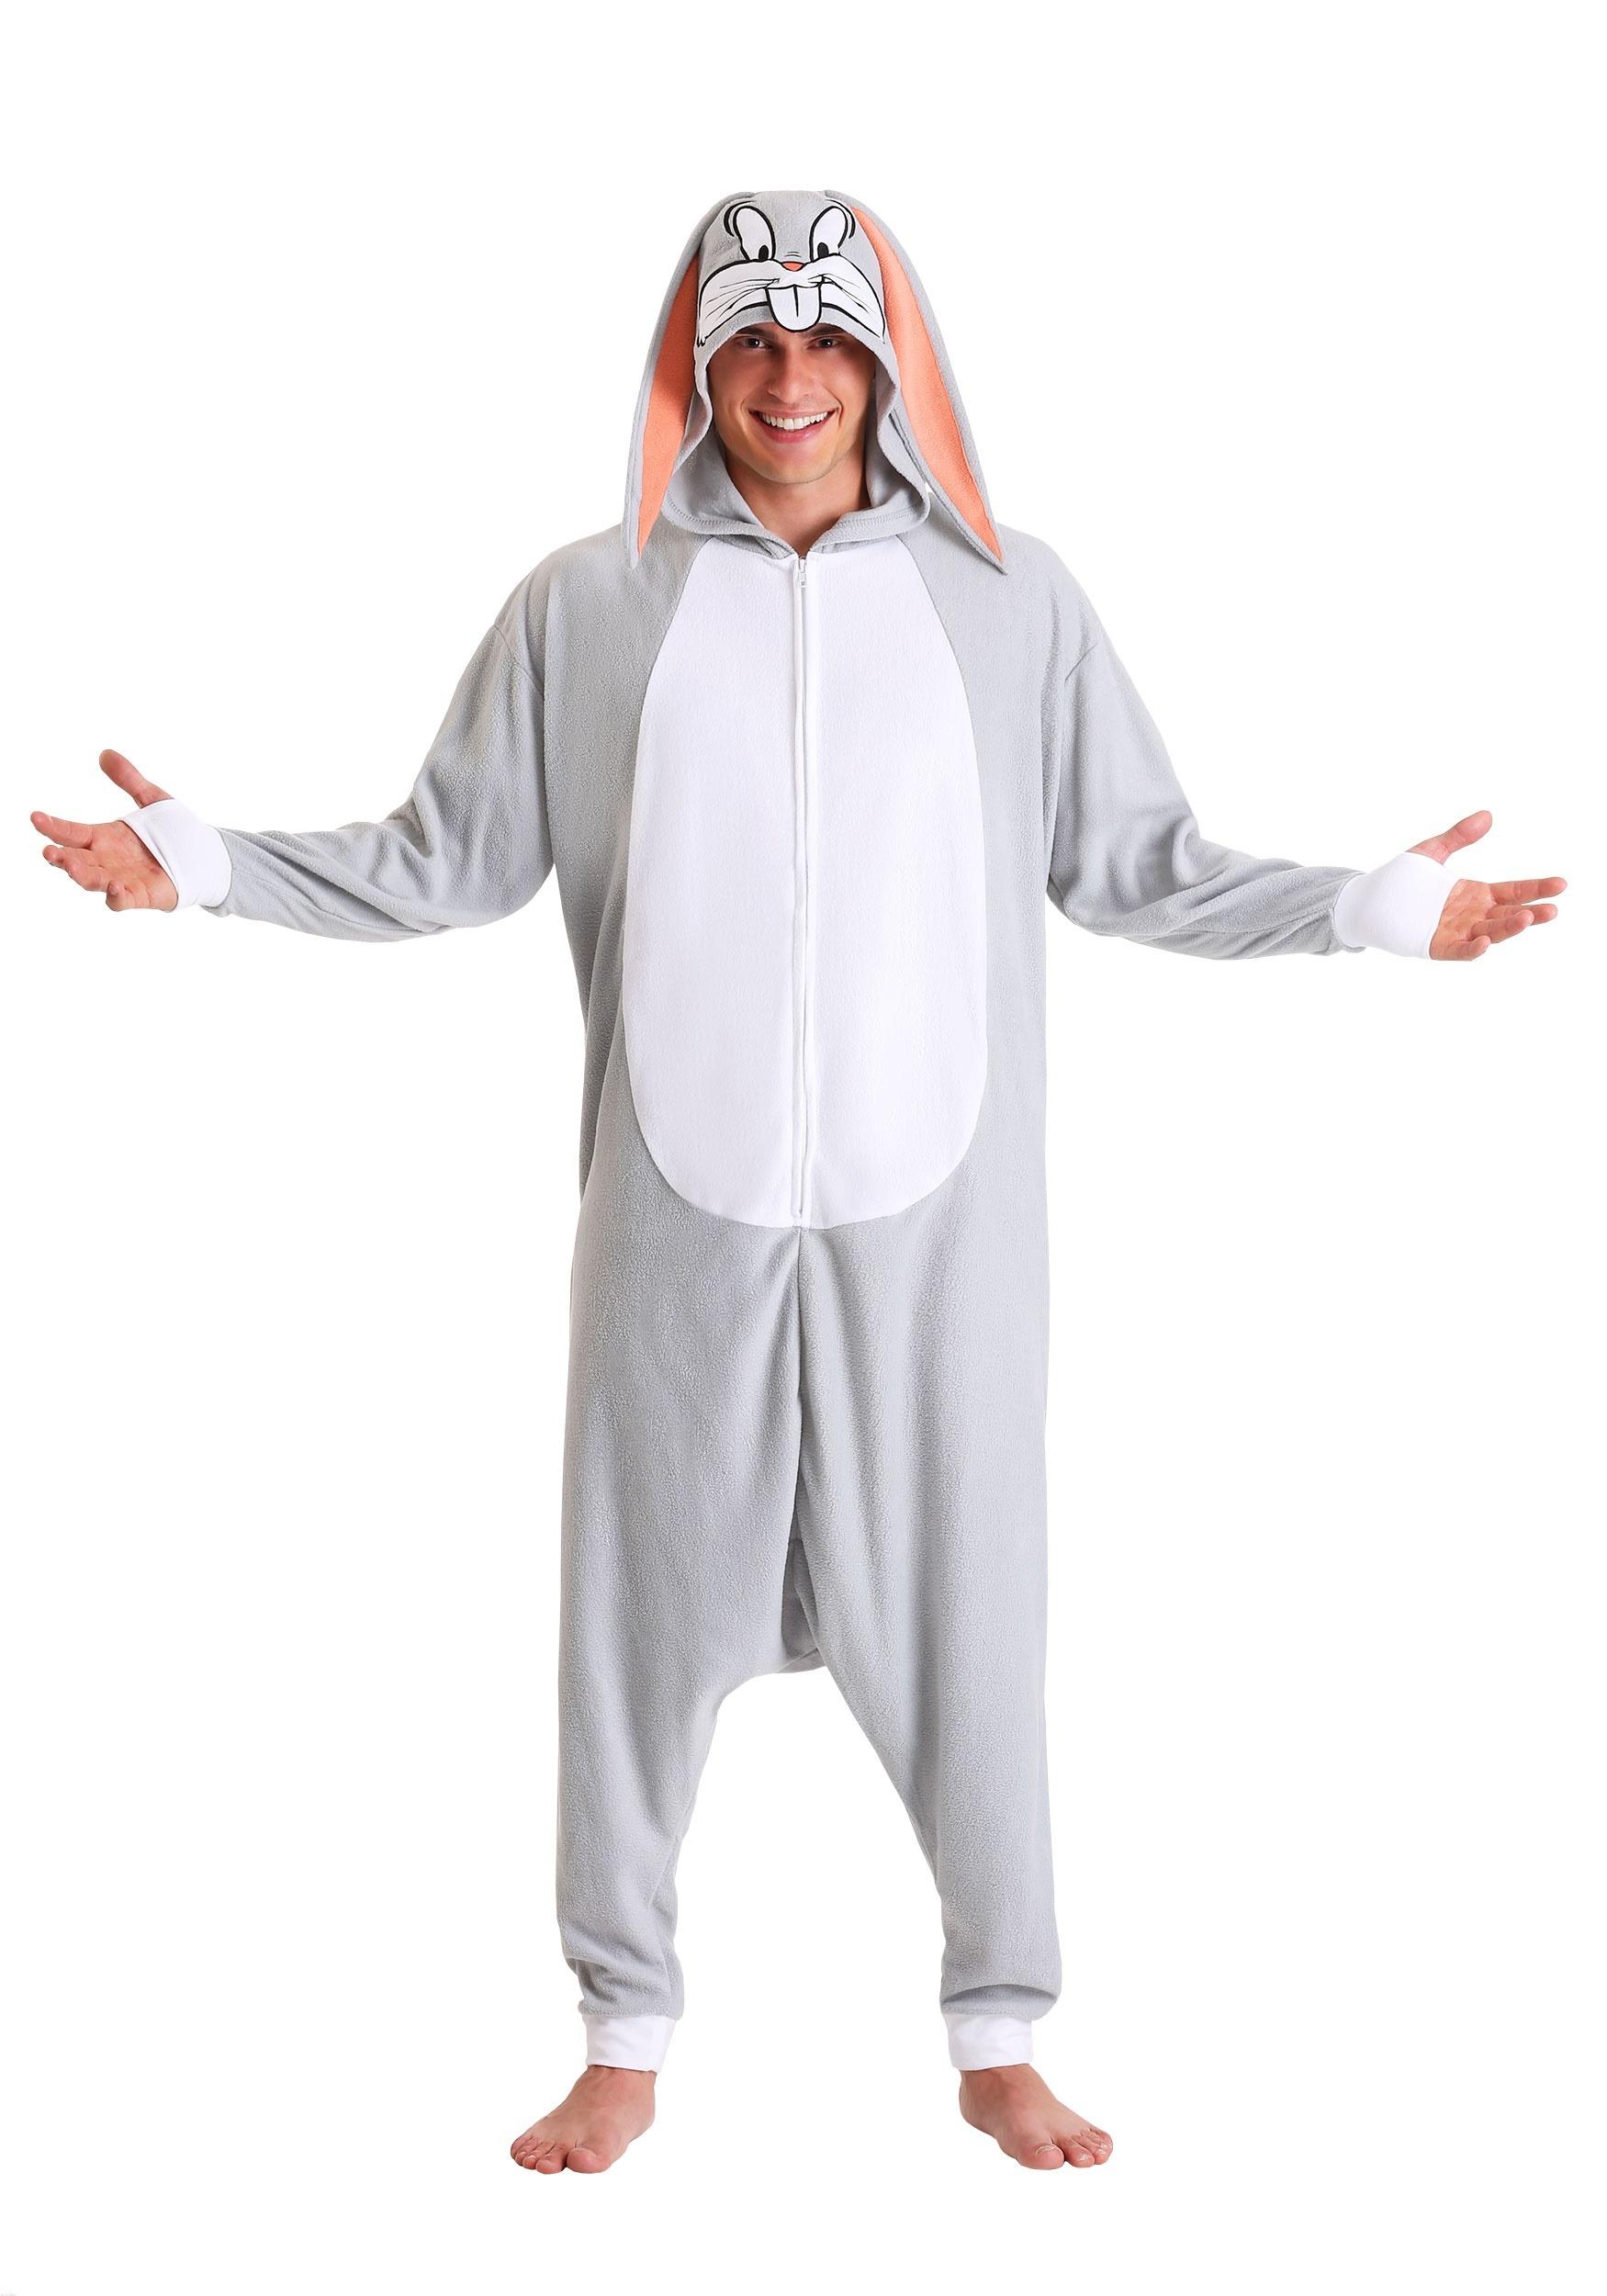 Bugs Bunny Kigurumi Pajamas 78a76baac518a